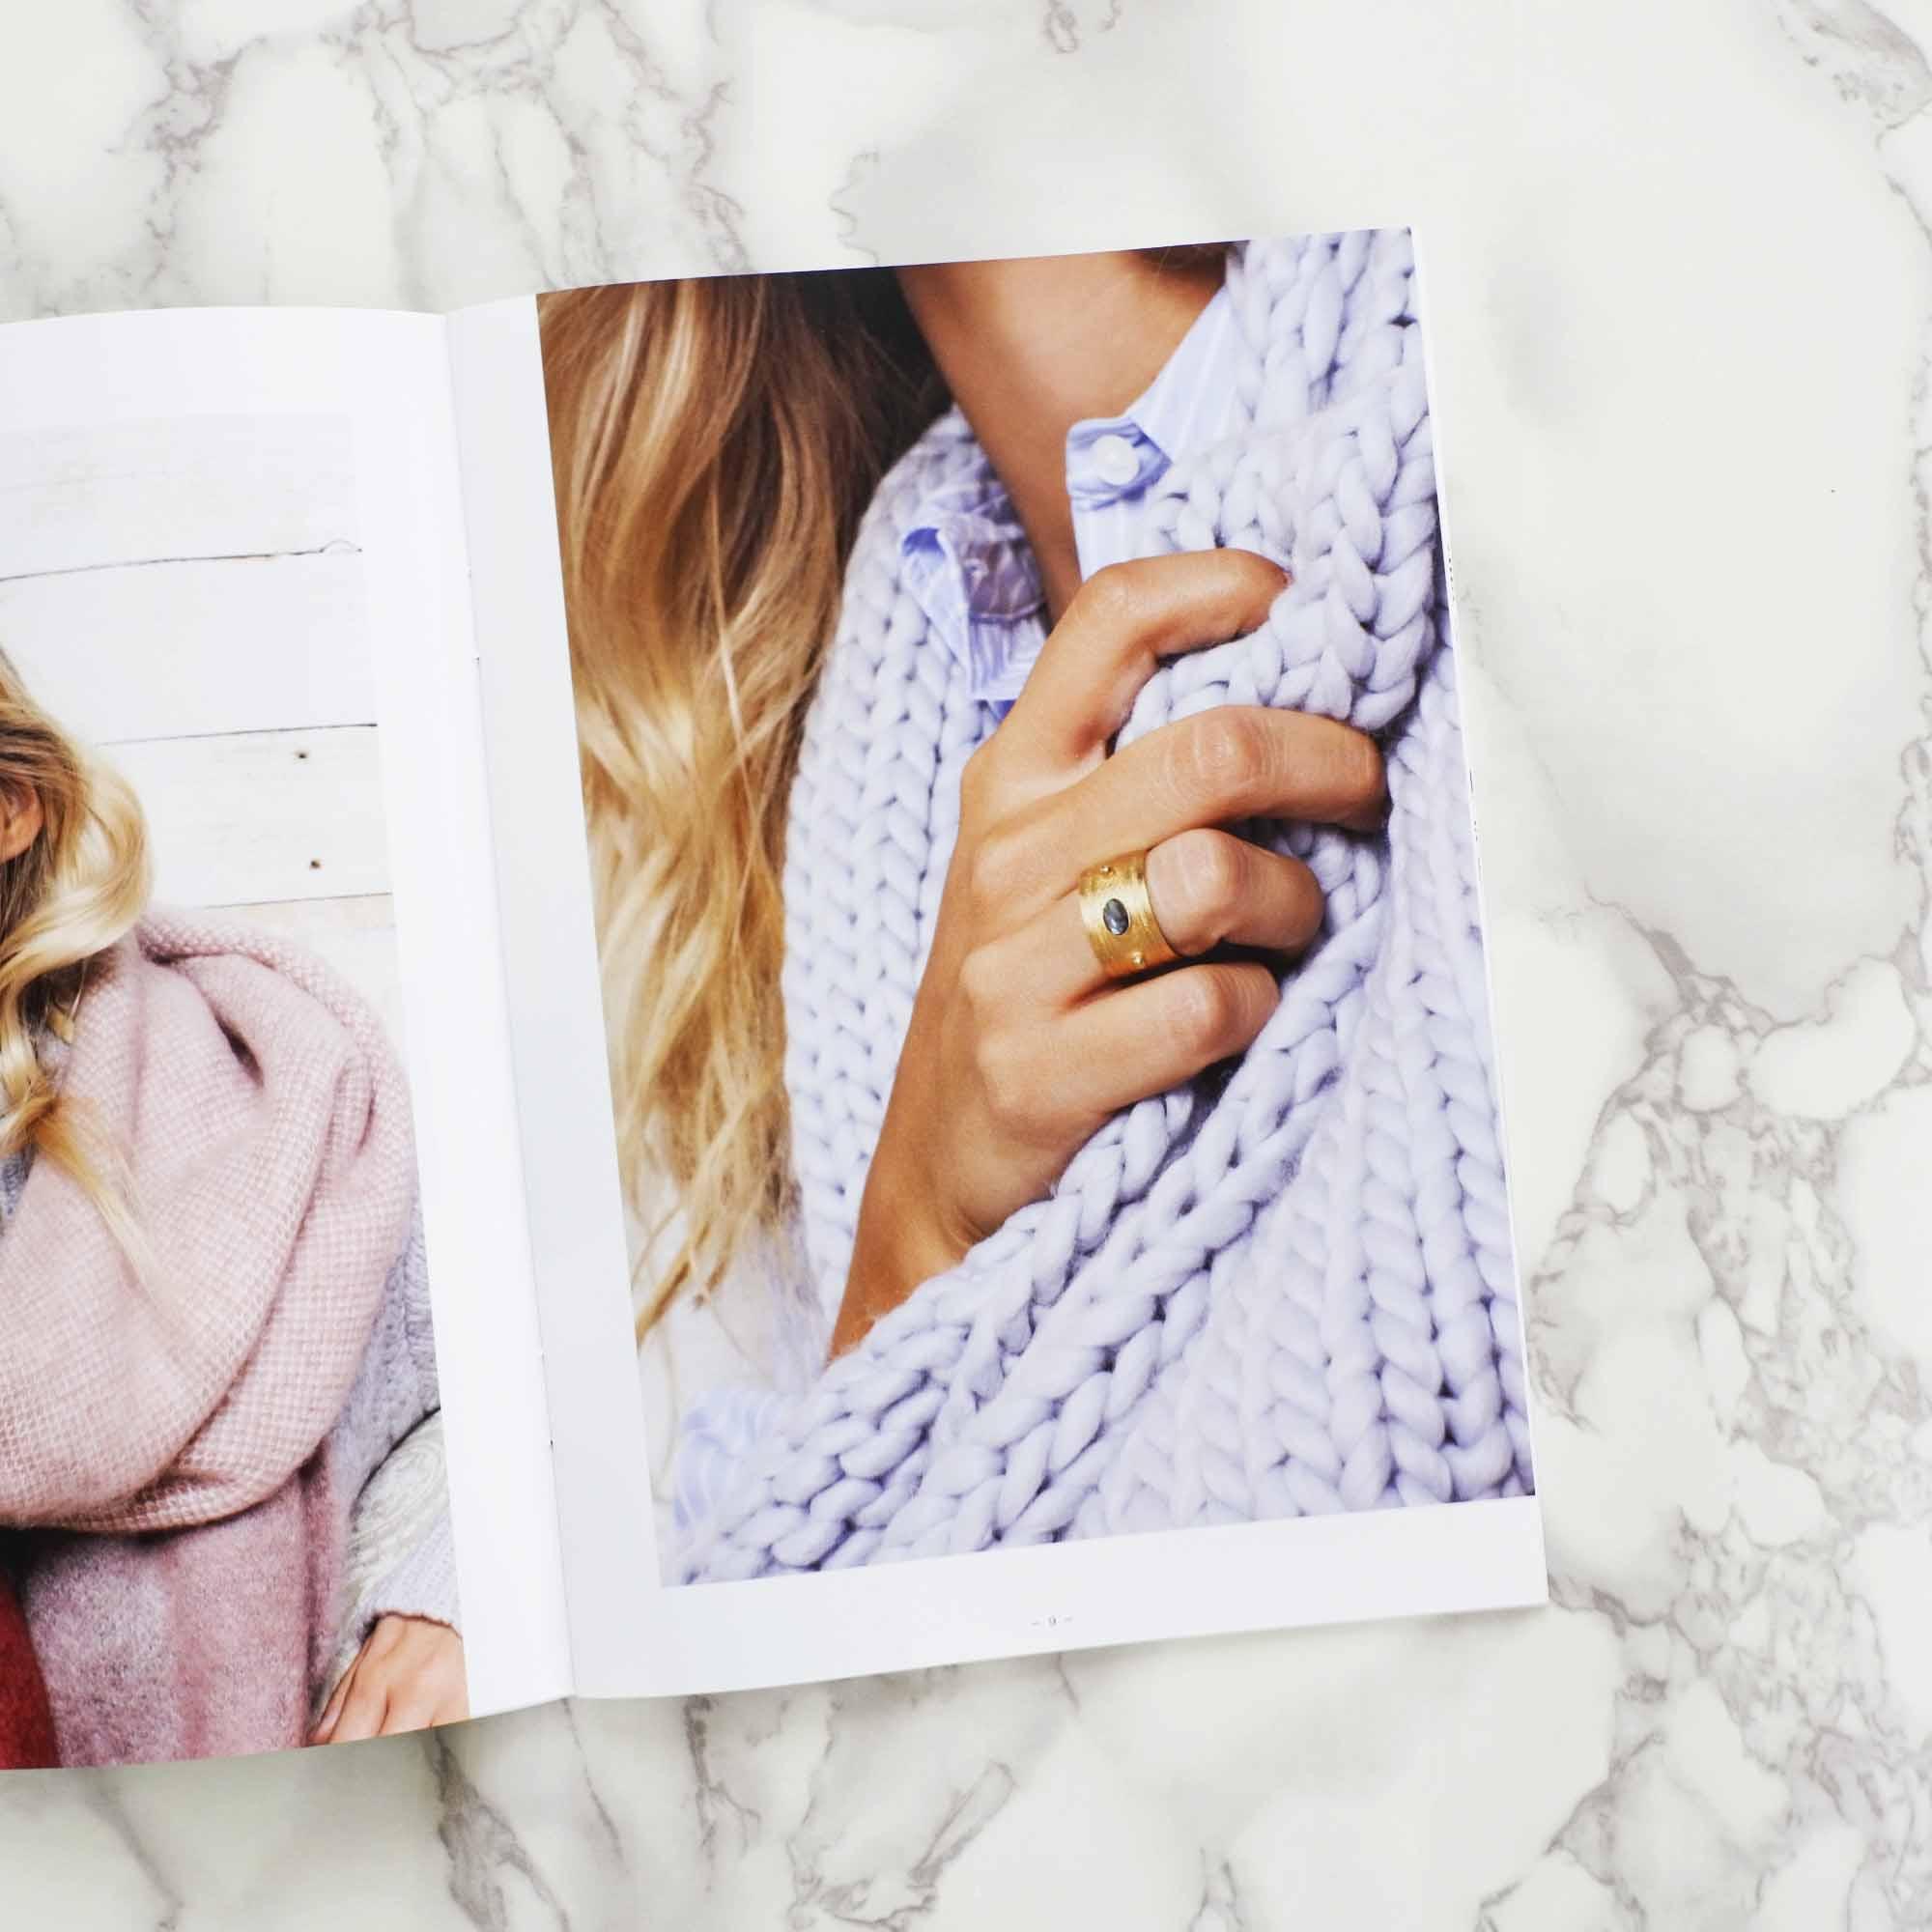 Emma & Chloe January 2017 Item - L'Atelier Clandestin Gold Ring